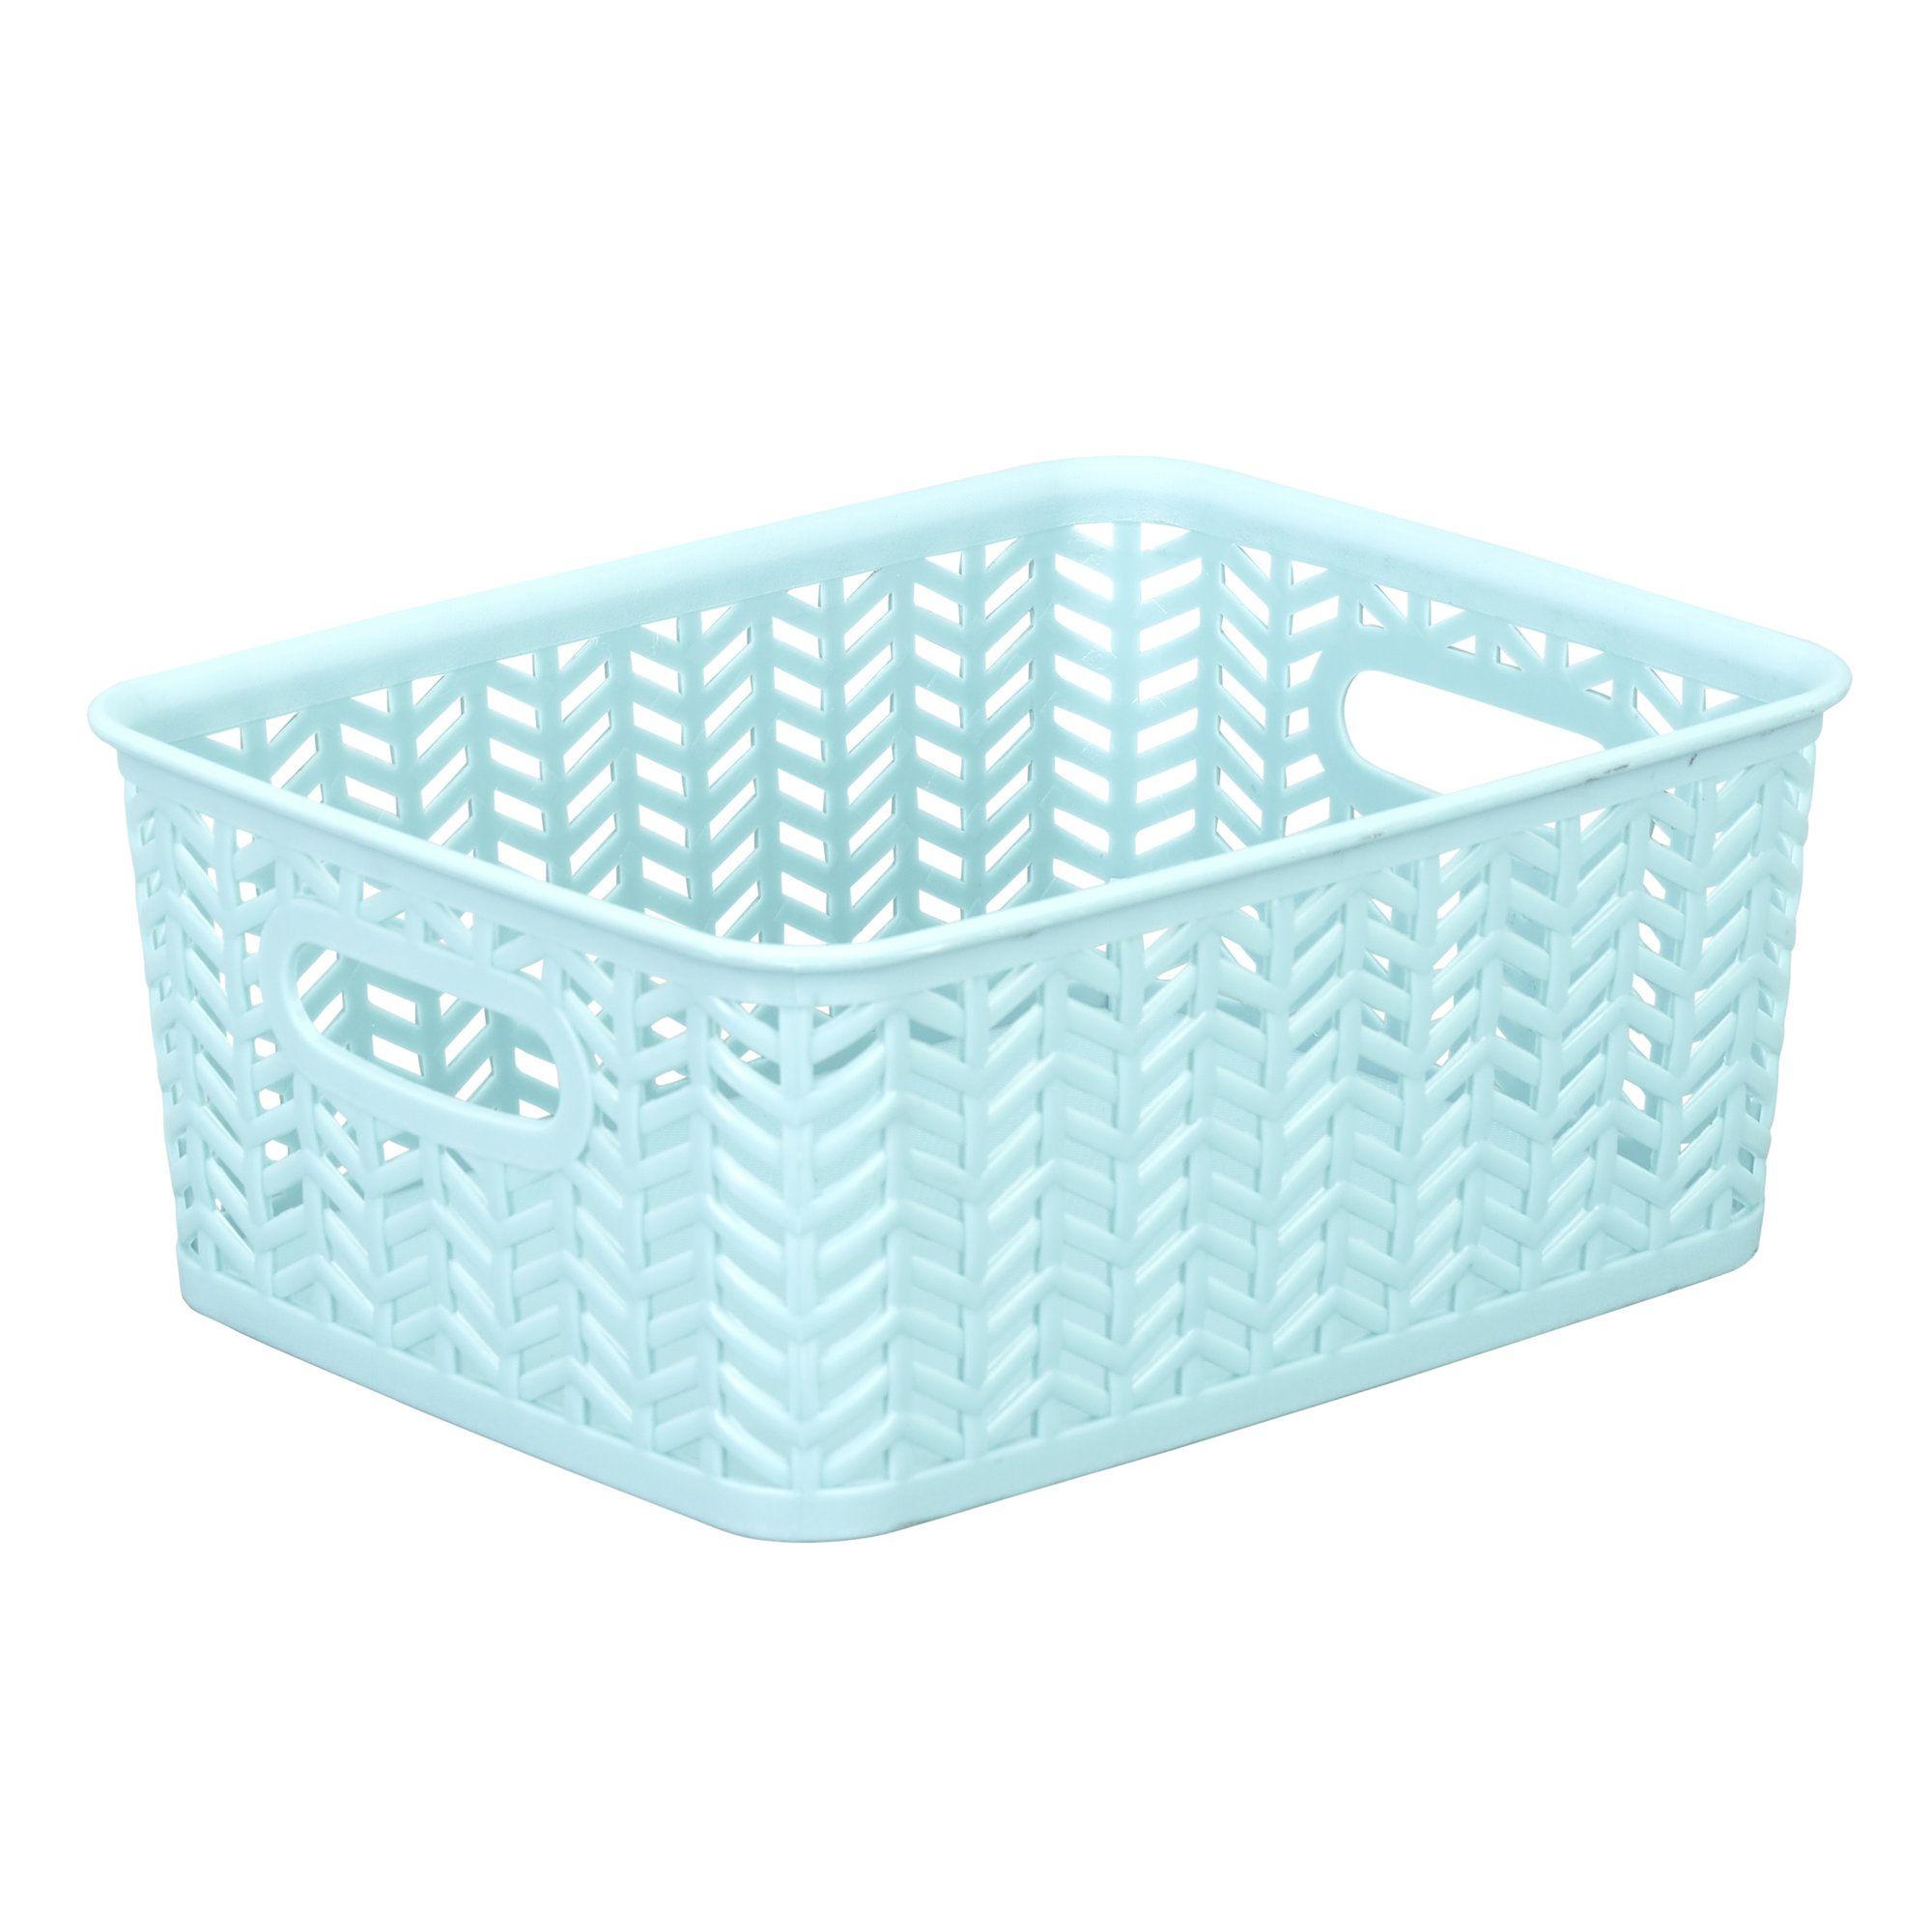 Herringbone Plastic Basket | Products | Pinterest | Plastic baskets ...